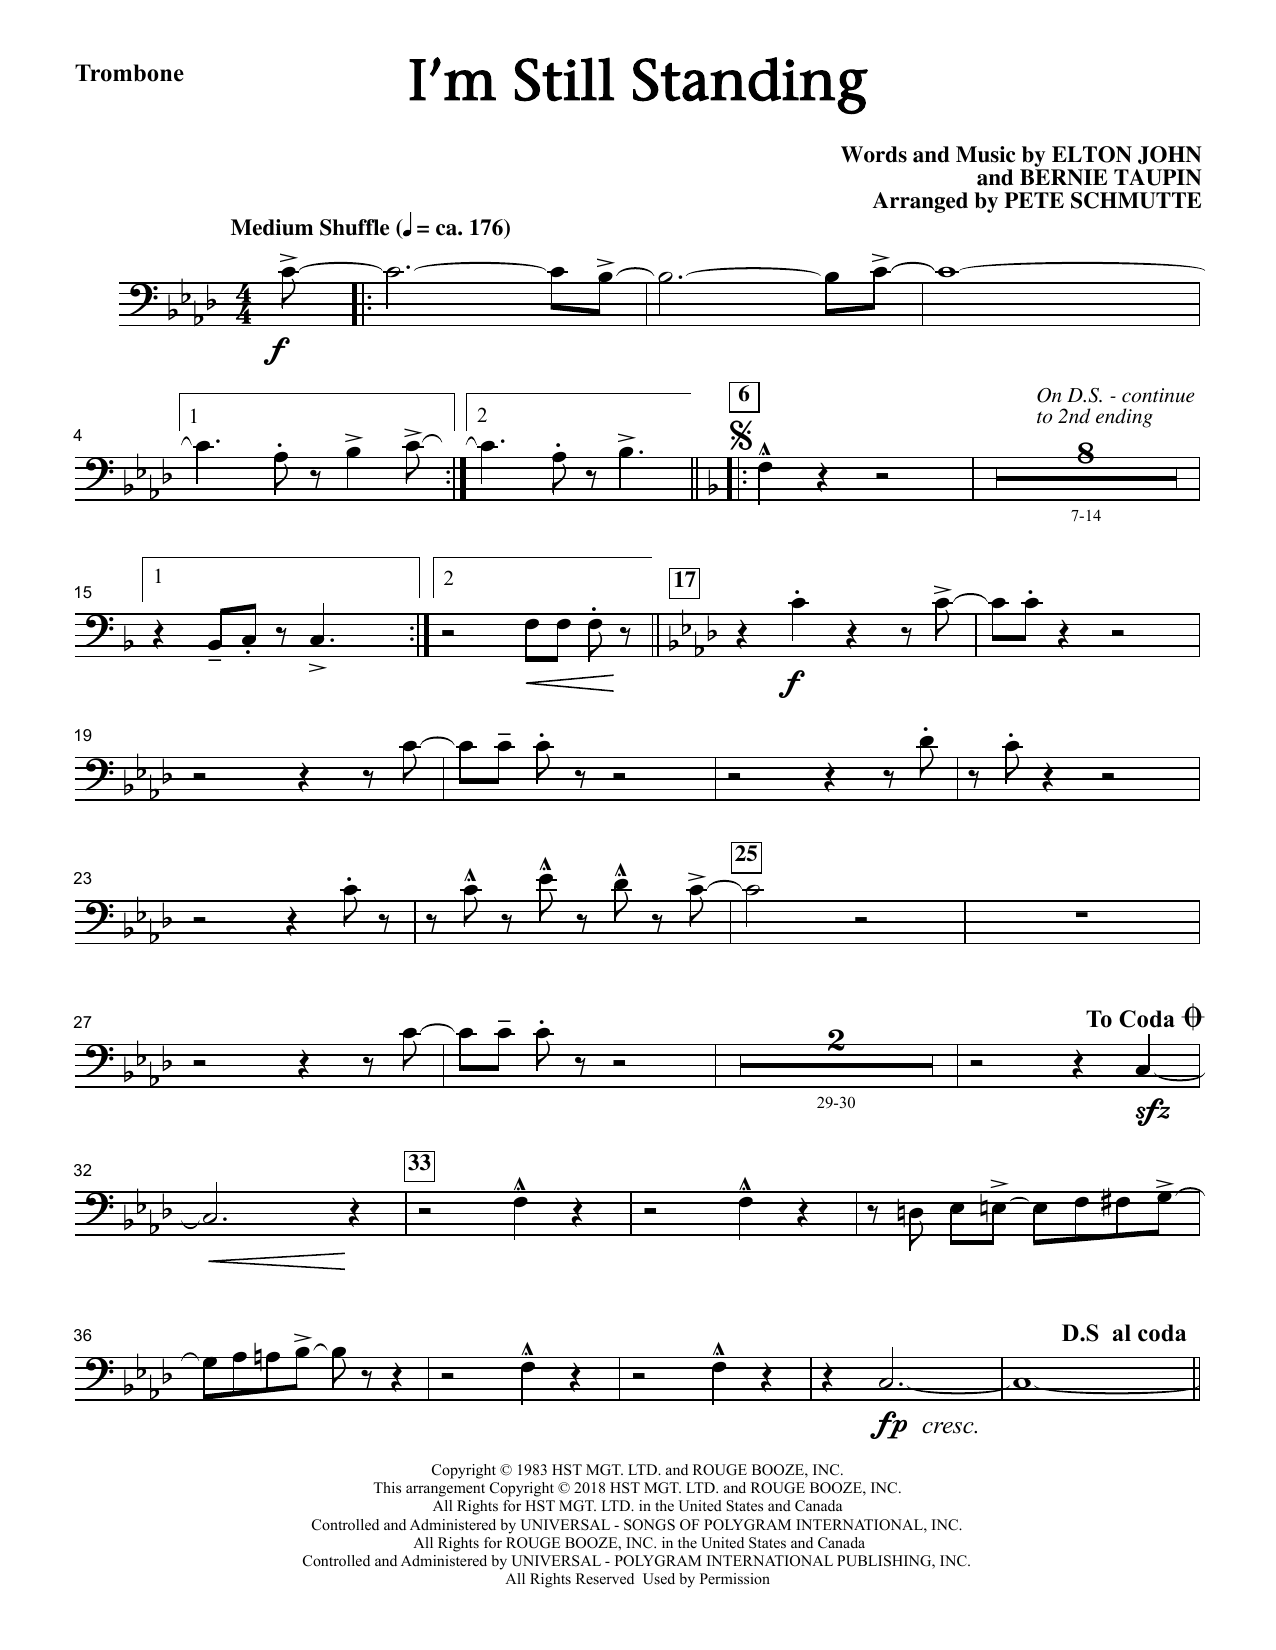 Elton John I'm Still Standing (arr. Pete Schmutte) - Trombone sheet music notes printable PDF score